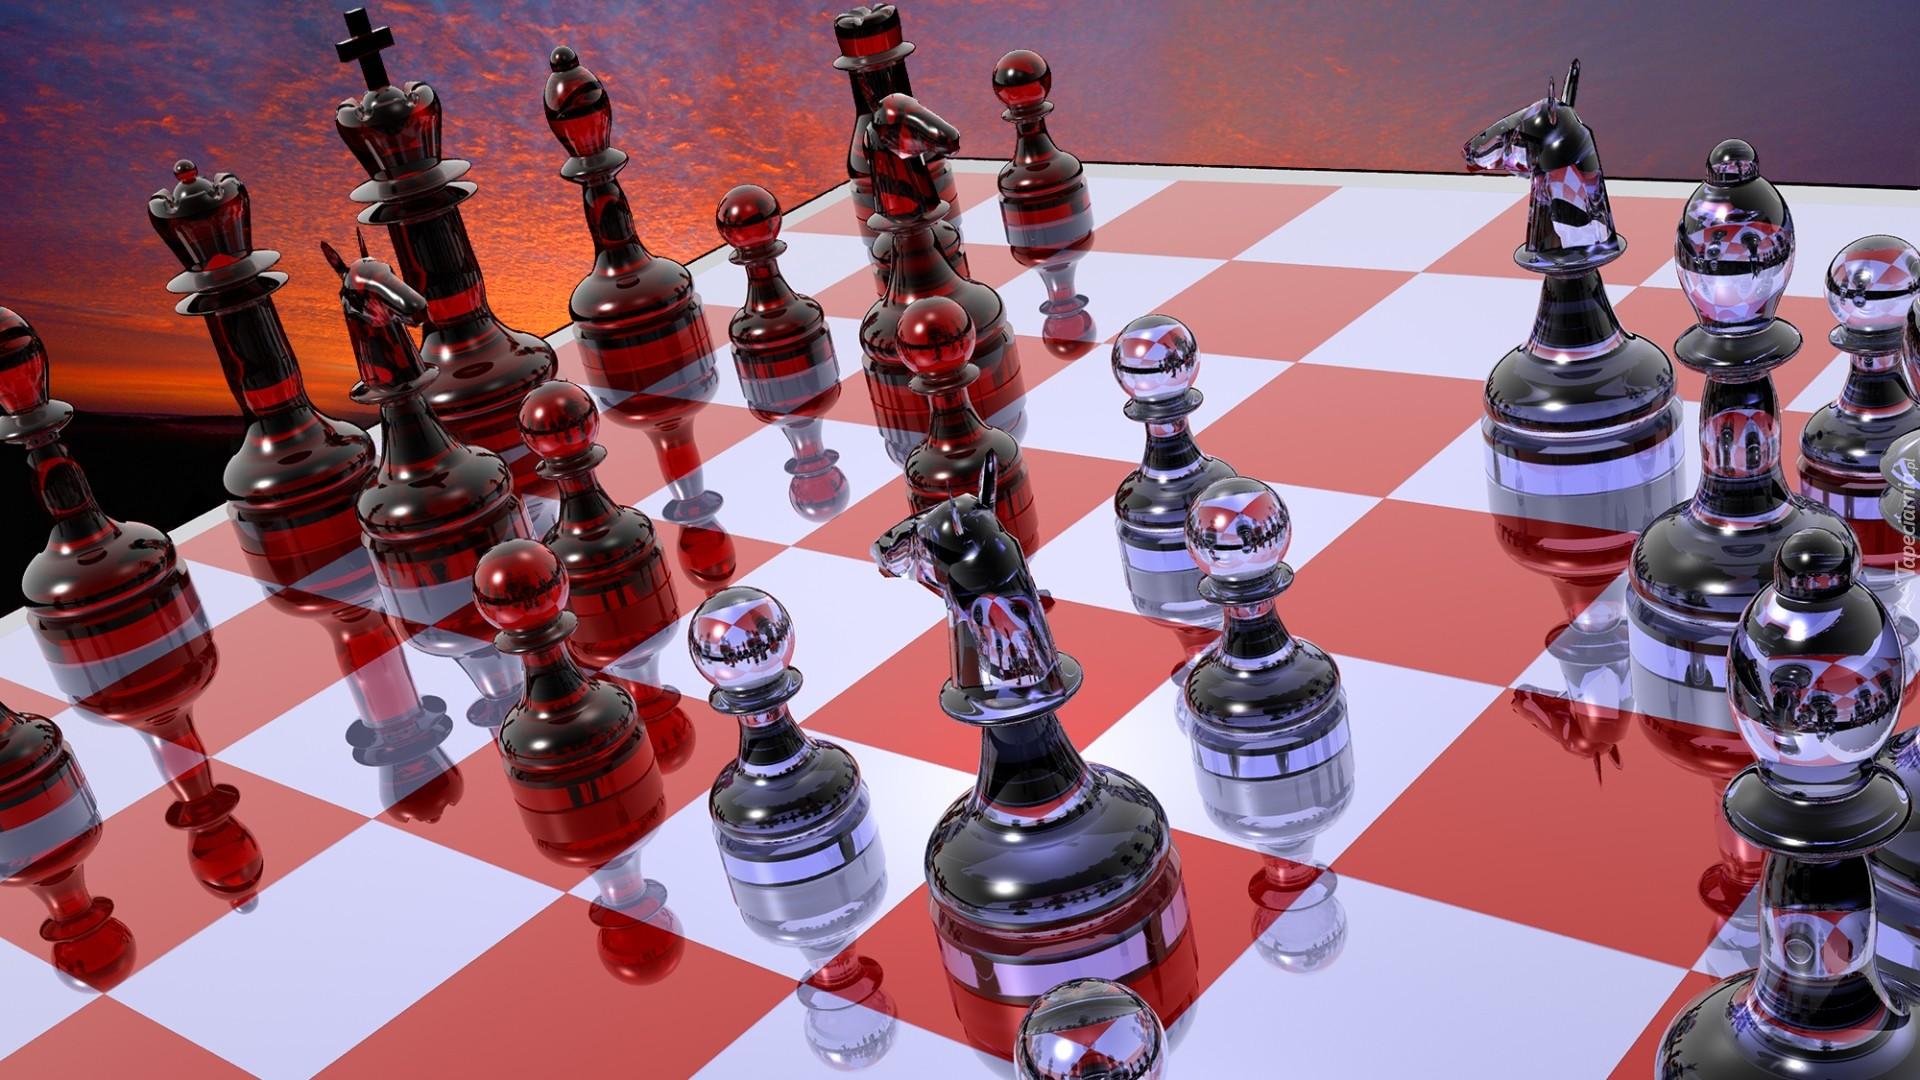 Chess Wallpaper image hd